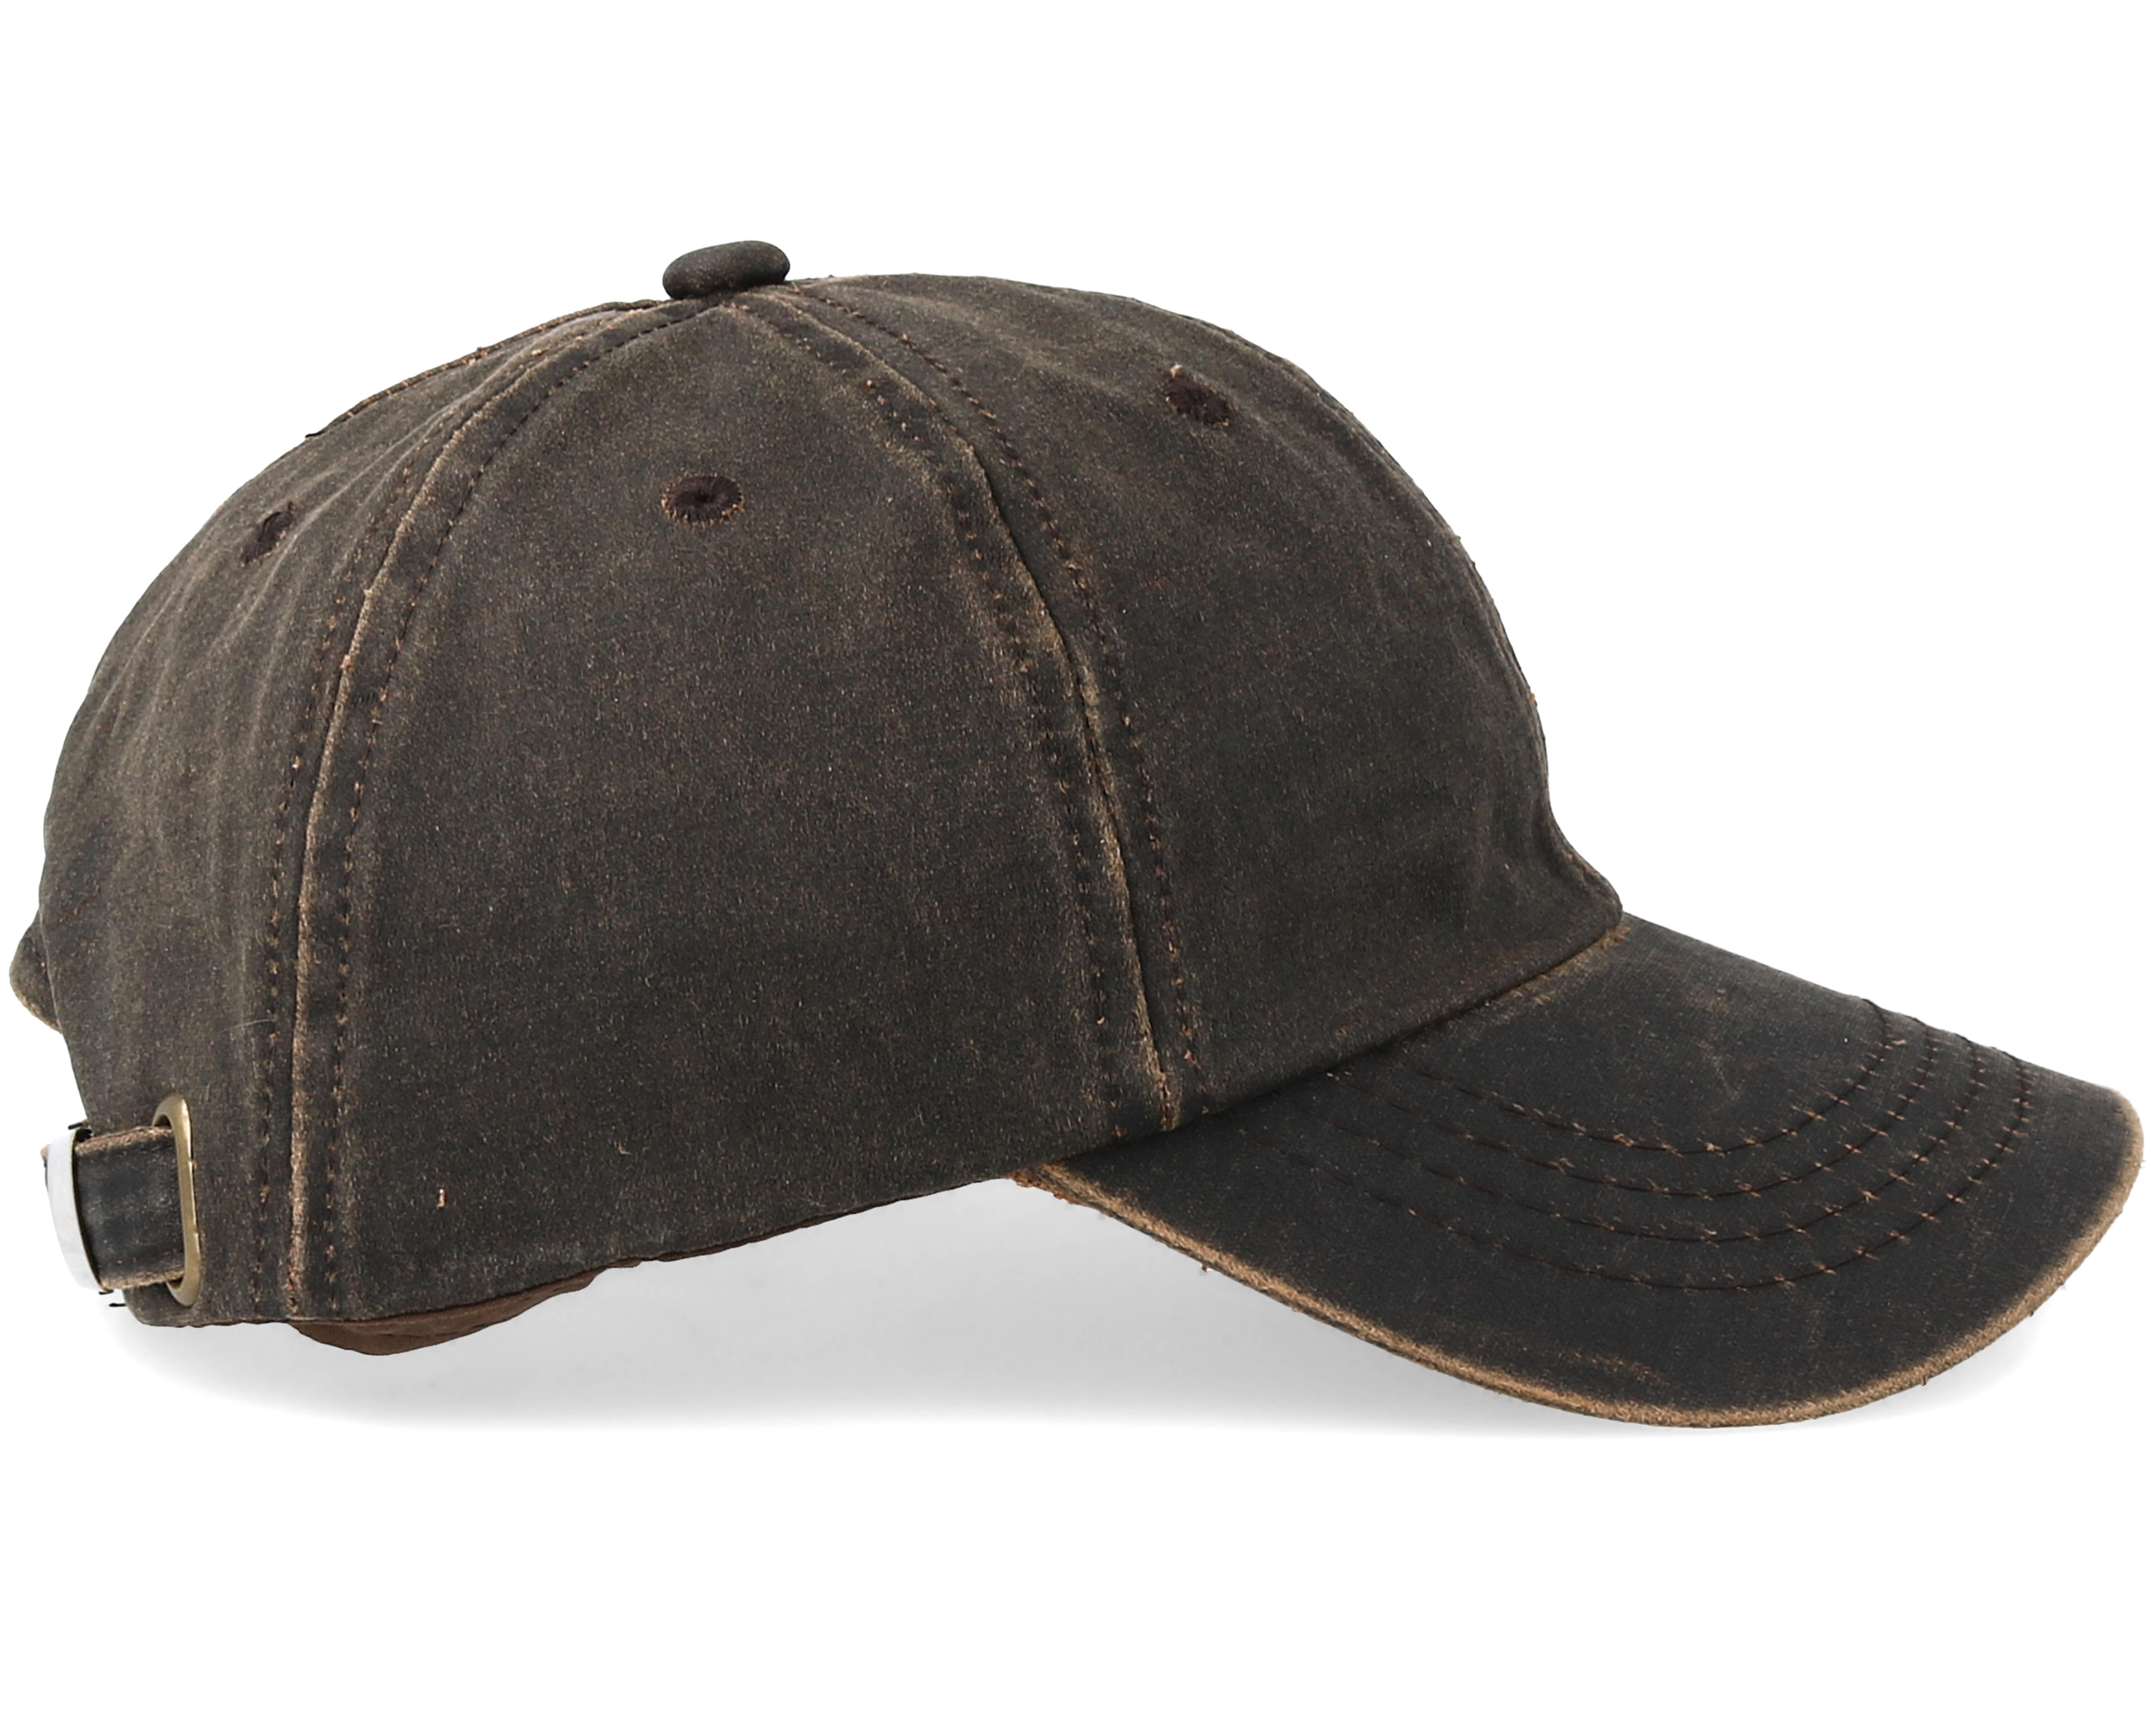 Baseball Cap Brown Adjustable Stetson Keps Hatstore Se